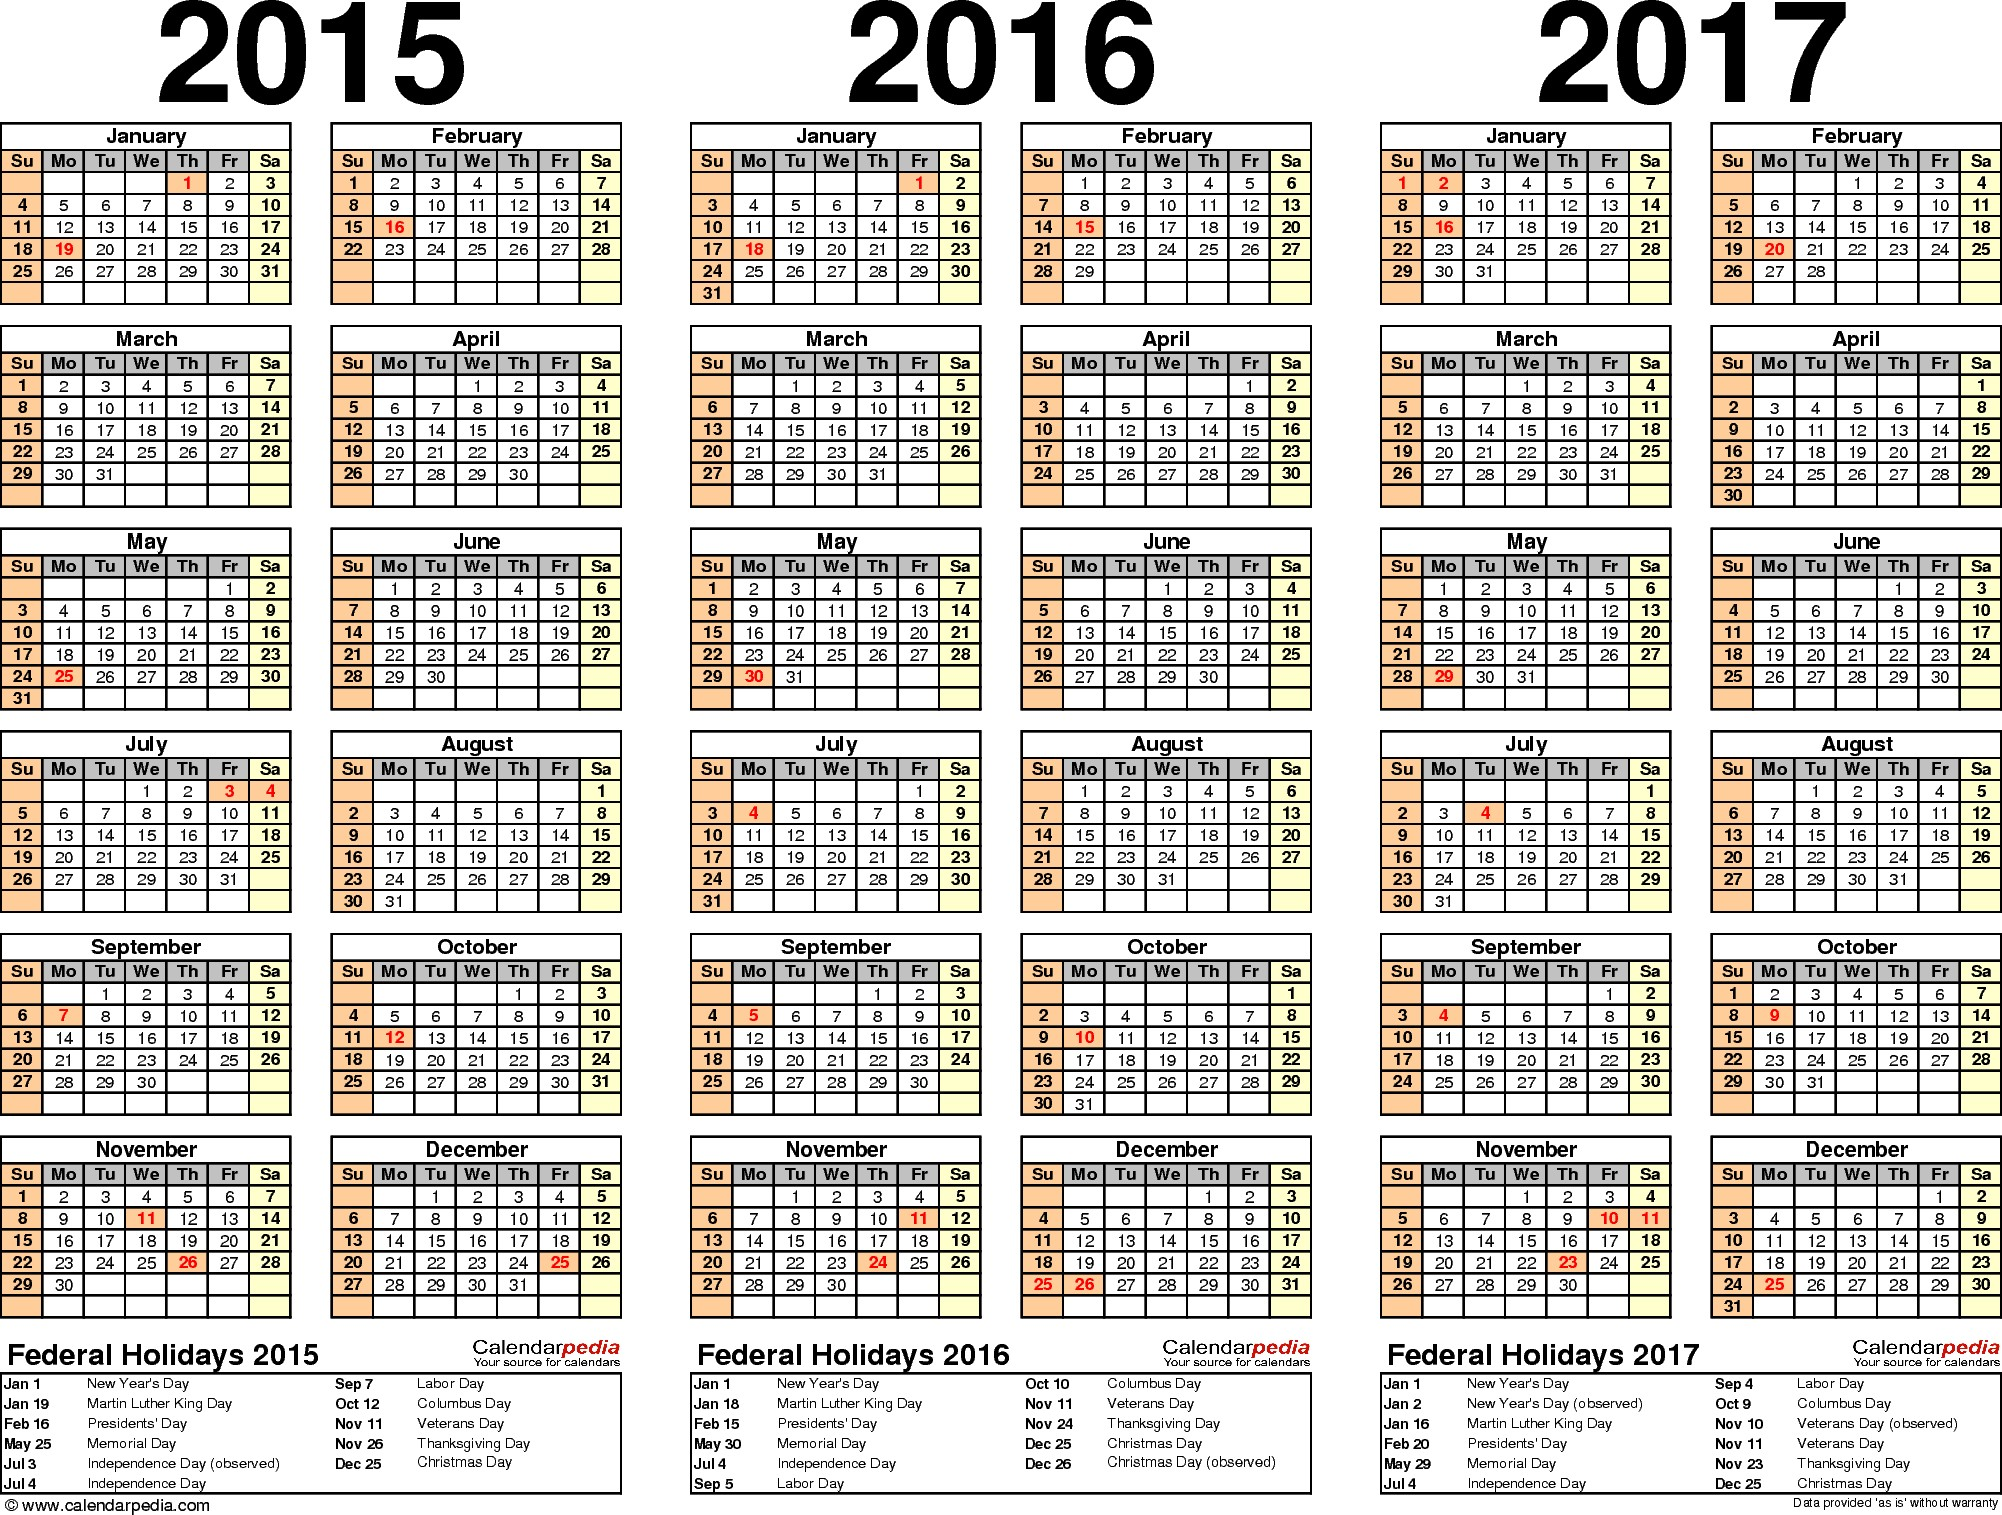 January 2019 Calendar Planner Actual 2015 2016 2017 Calendar 4 Three Year Printable Pdf Calendars Of January 2019 Calendar Planner Más Caliente Custom Editable Free Printable 2019 Calendars